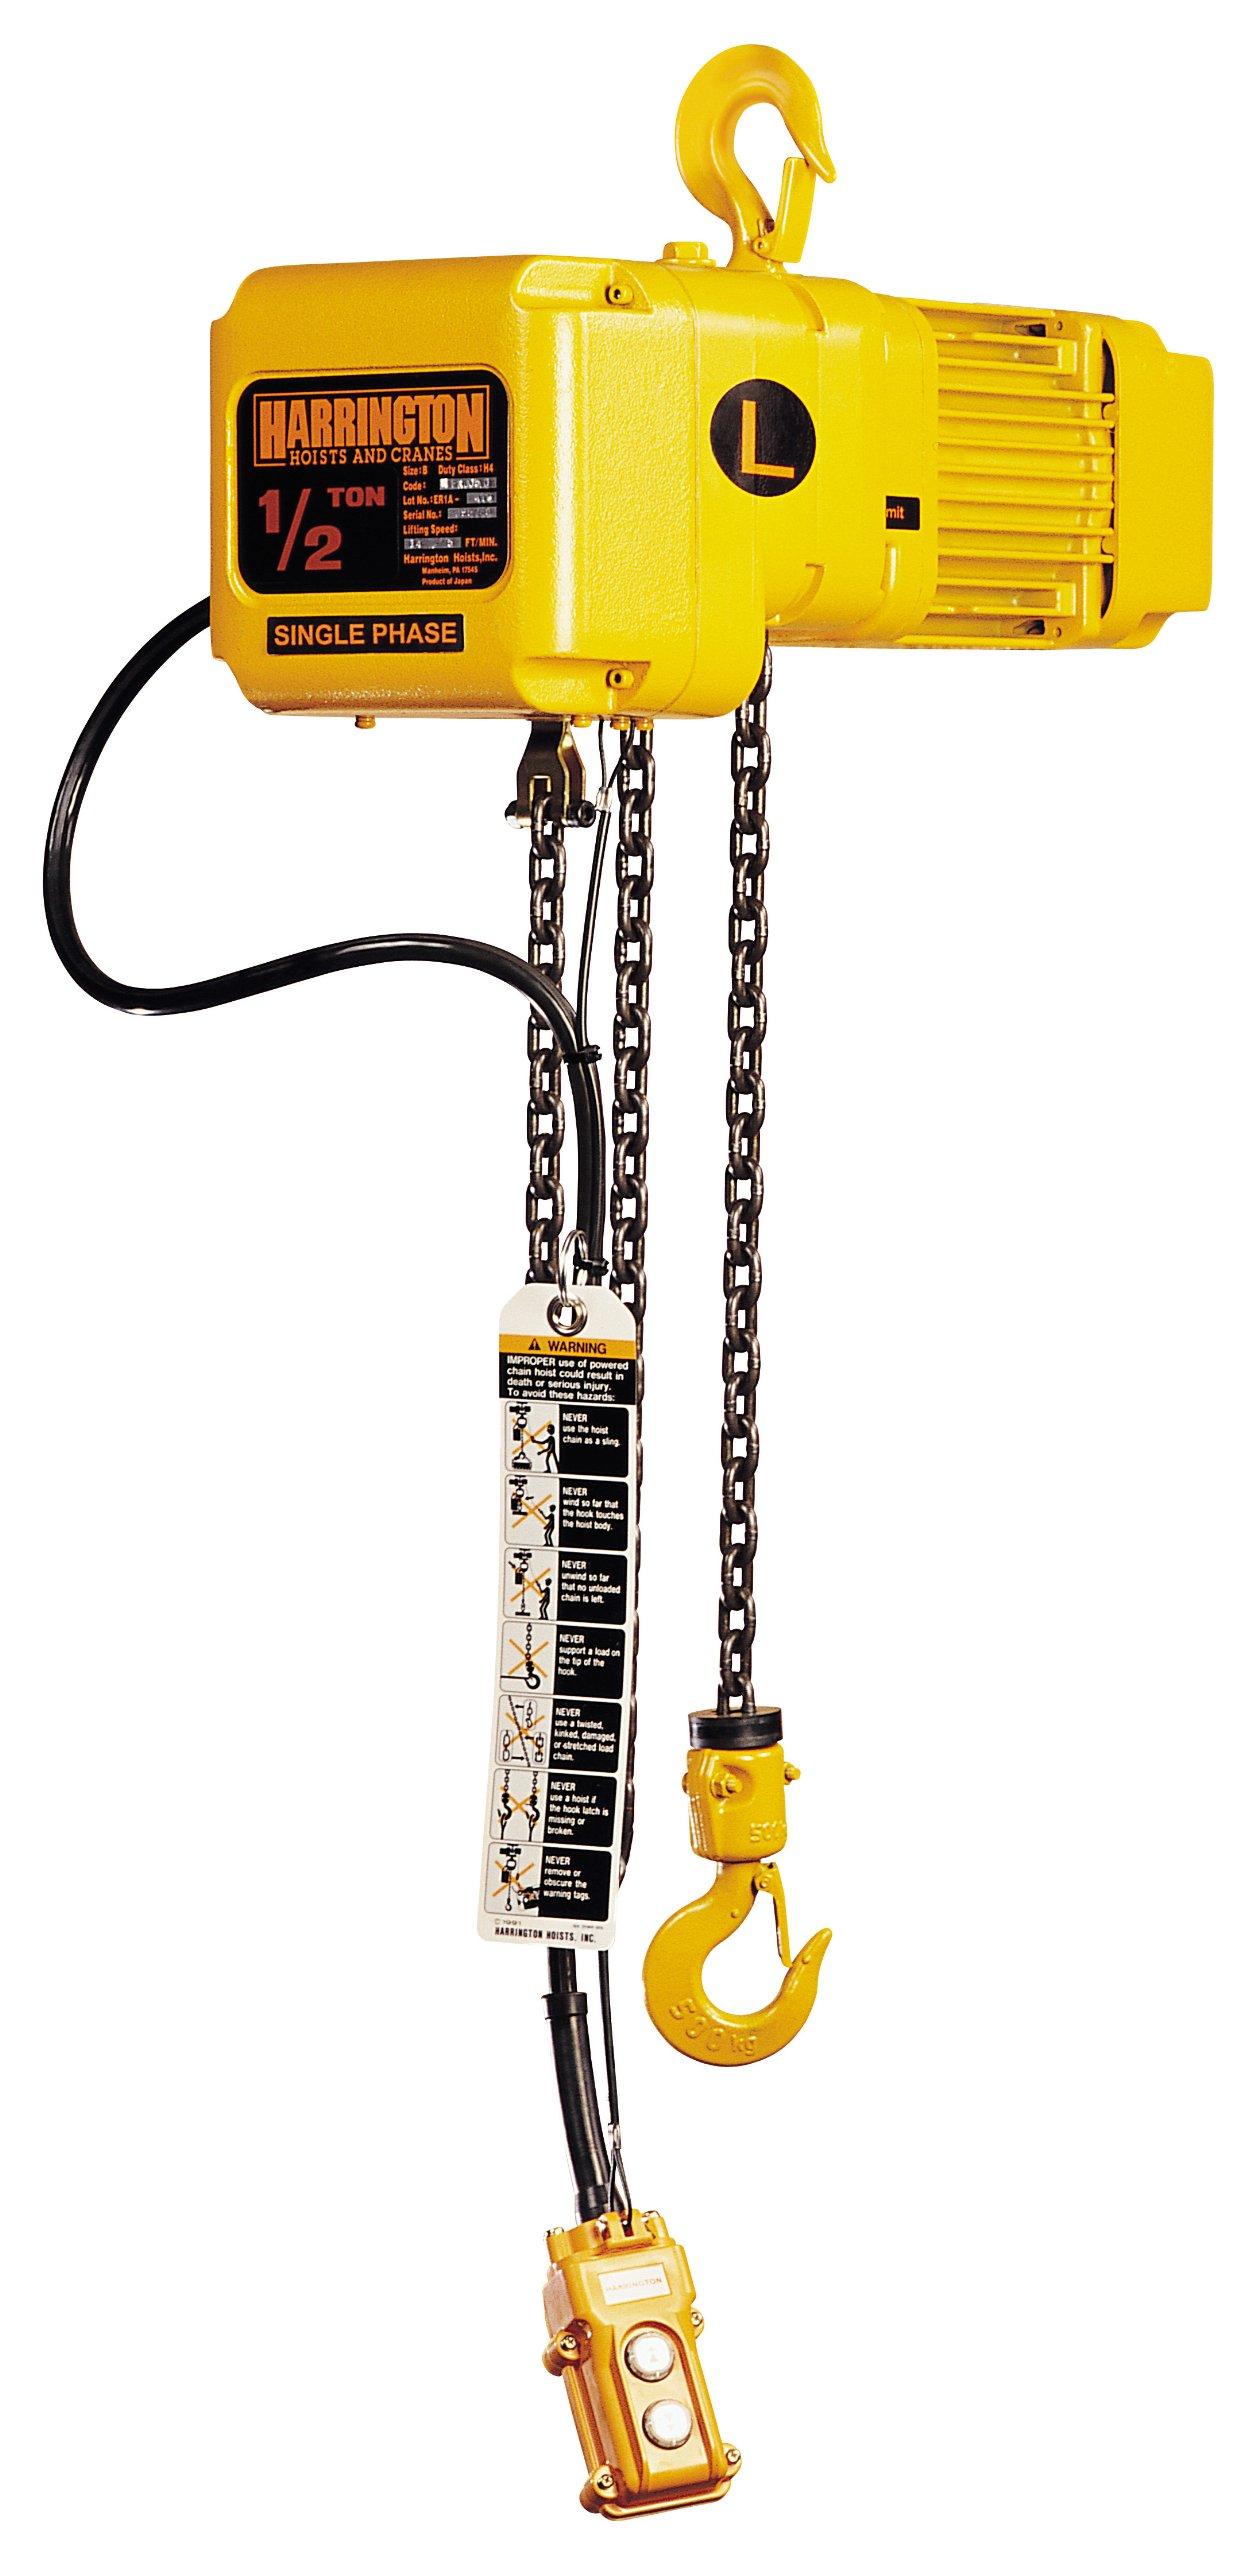 12.8 Headroom Harrington CF Hand Chain Hoist 1//2 Ton Capacity 1.1 Hook Opening 20/' Lift 12.8 Headroom 1.1 Hook Opening Harrington Hoists Inc Hook Mount 20 Lift